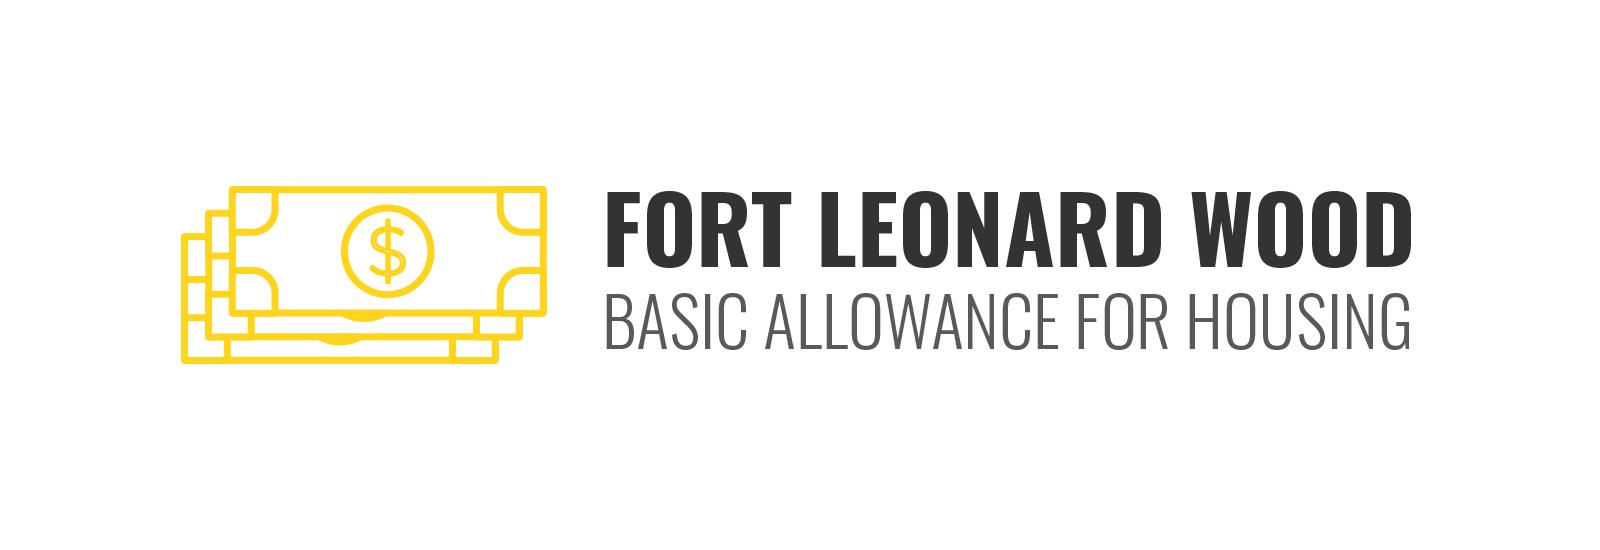 Fort Leonard Wood BAH